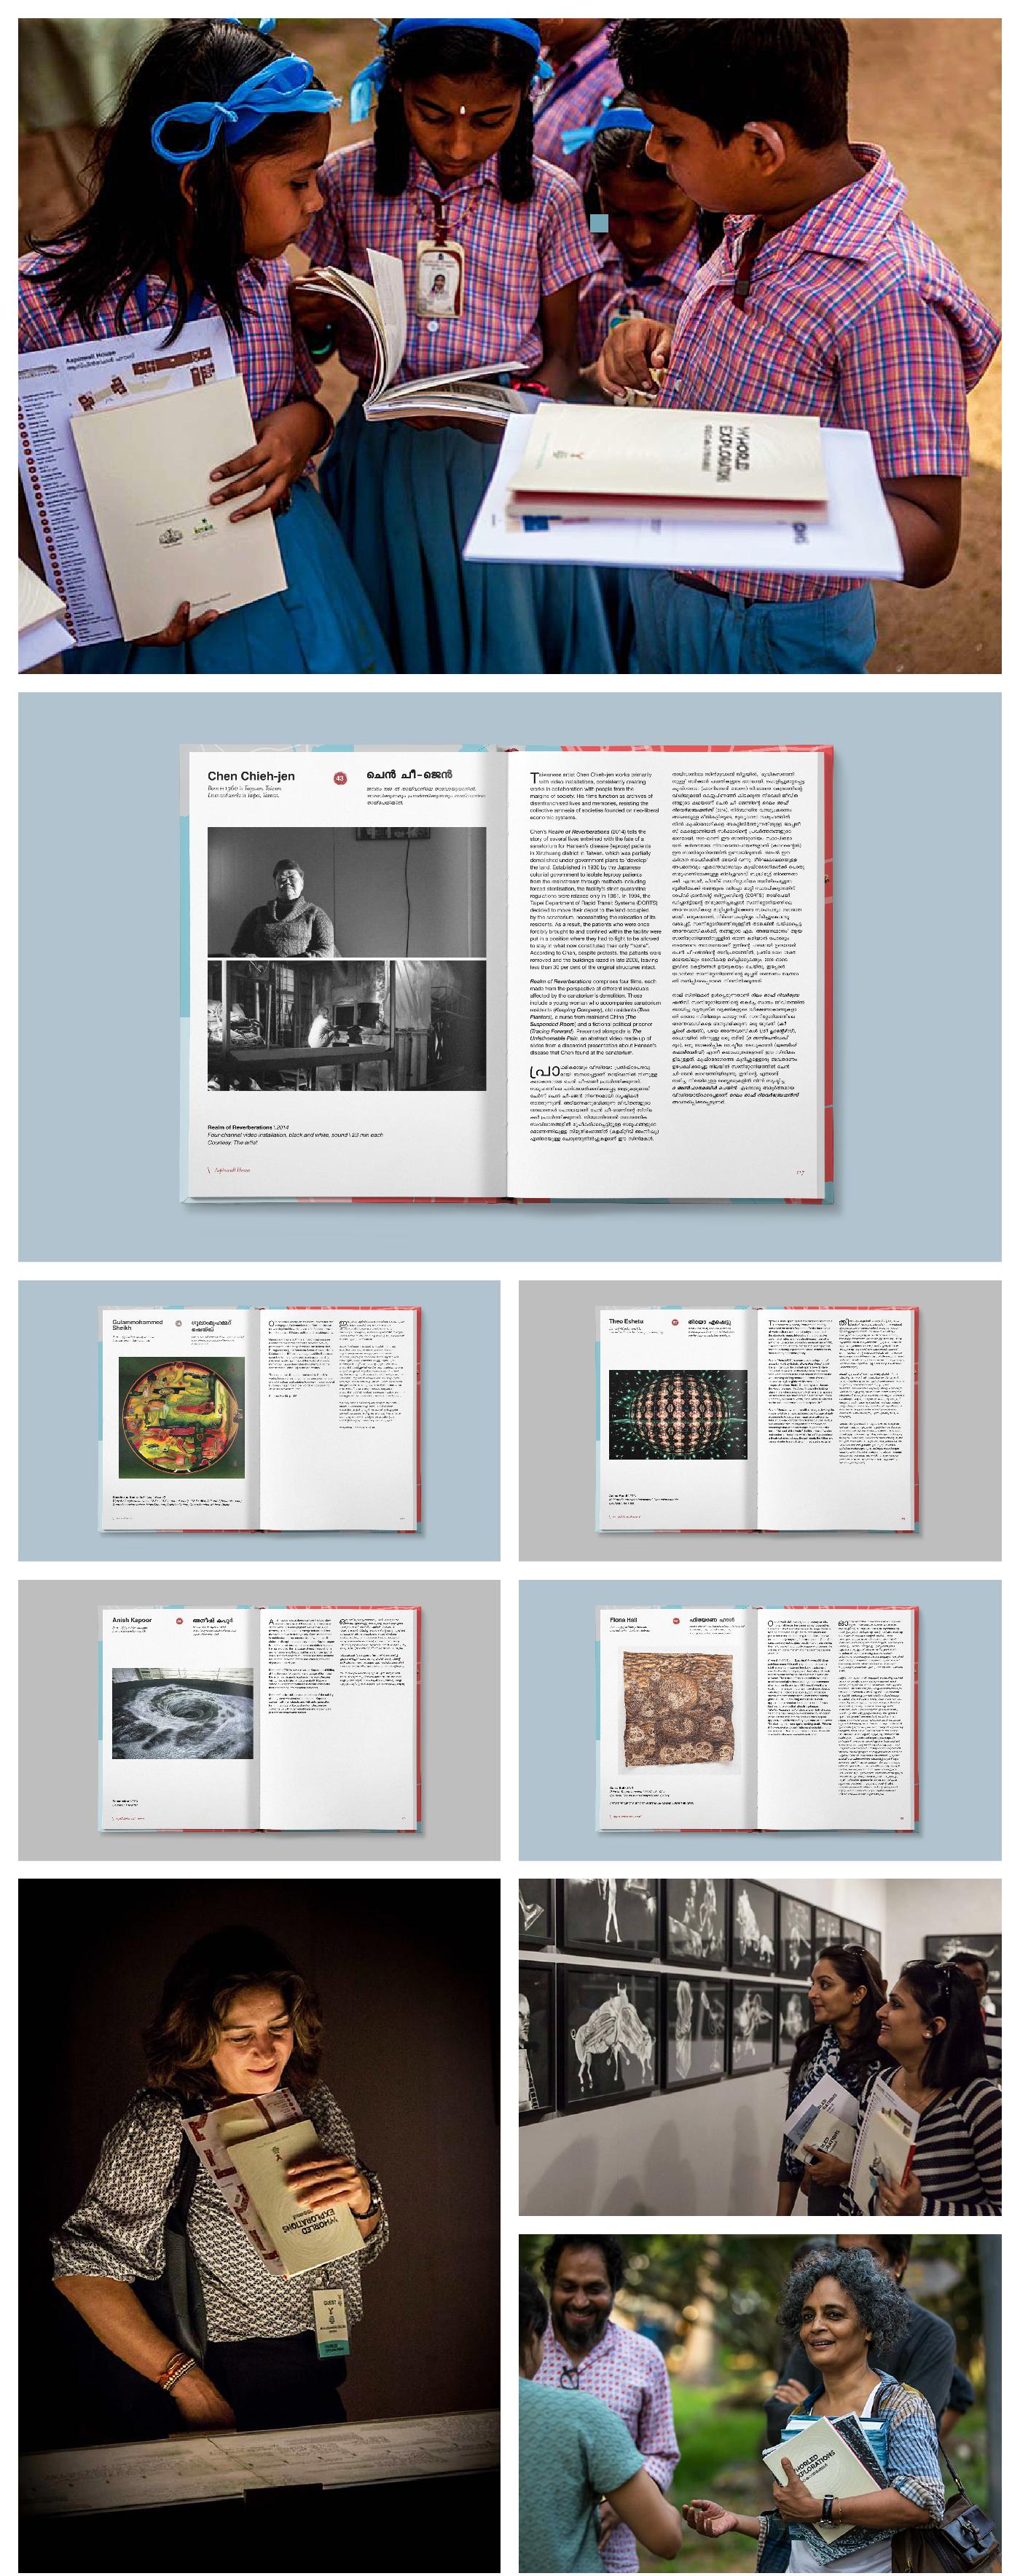 Whorled Explorations Kochi-Muziris Biennale 2014 Short Guide Exhibition  Kochi Southern India 95 artists 30 countries kerala Jitish Kallat